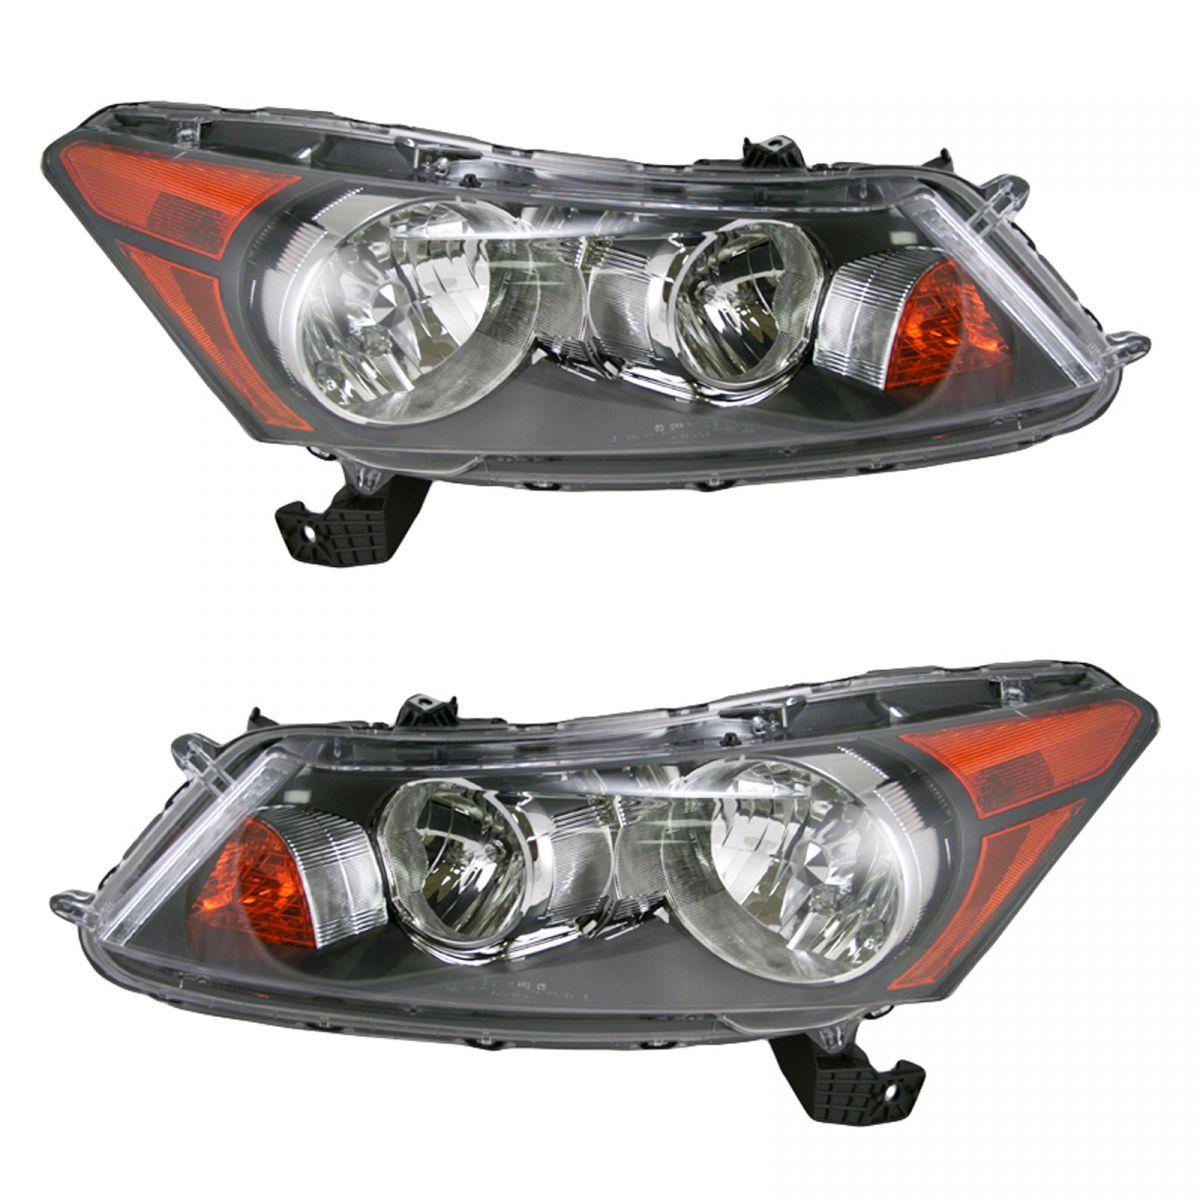 Front Headlights Headlamps Lights Lamps Pair Set for 08-12 Honda Accord Sedan